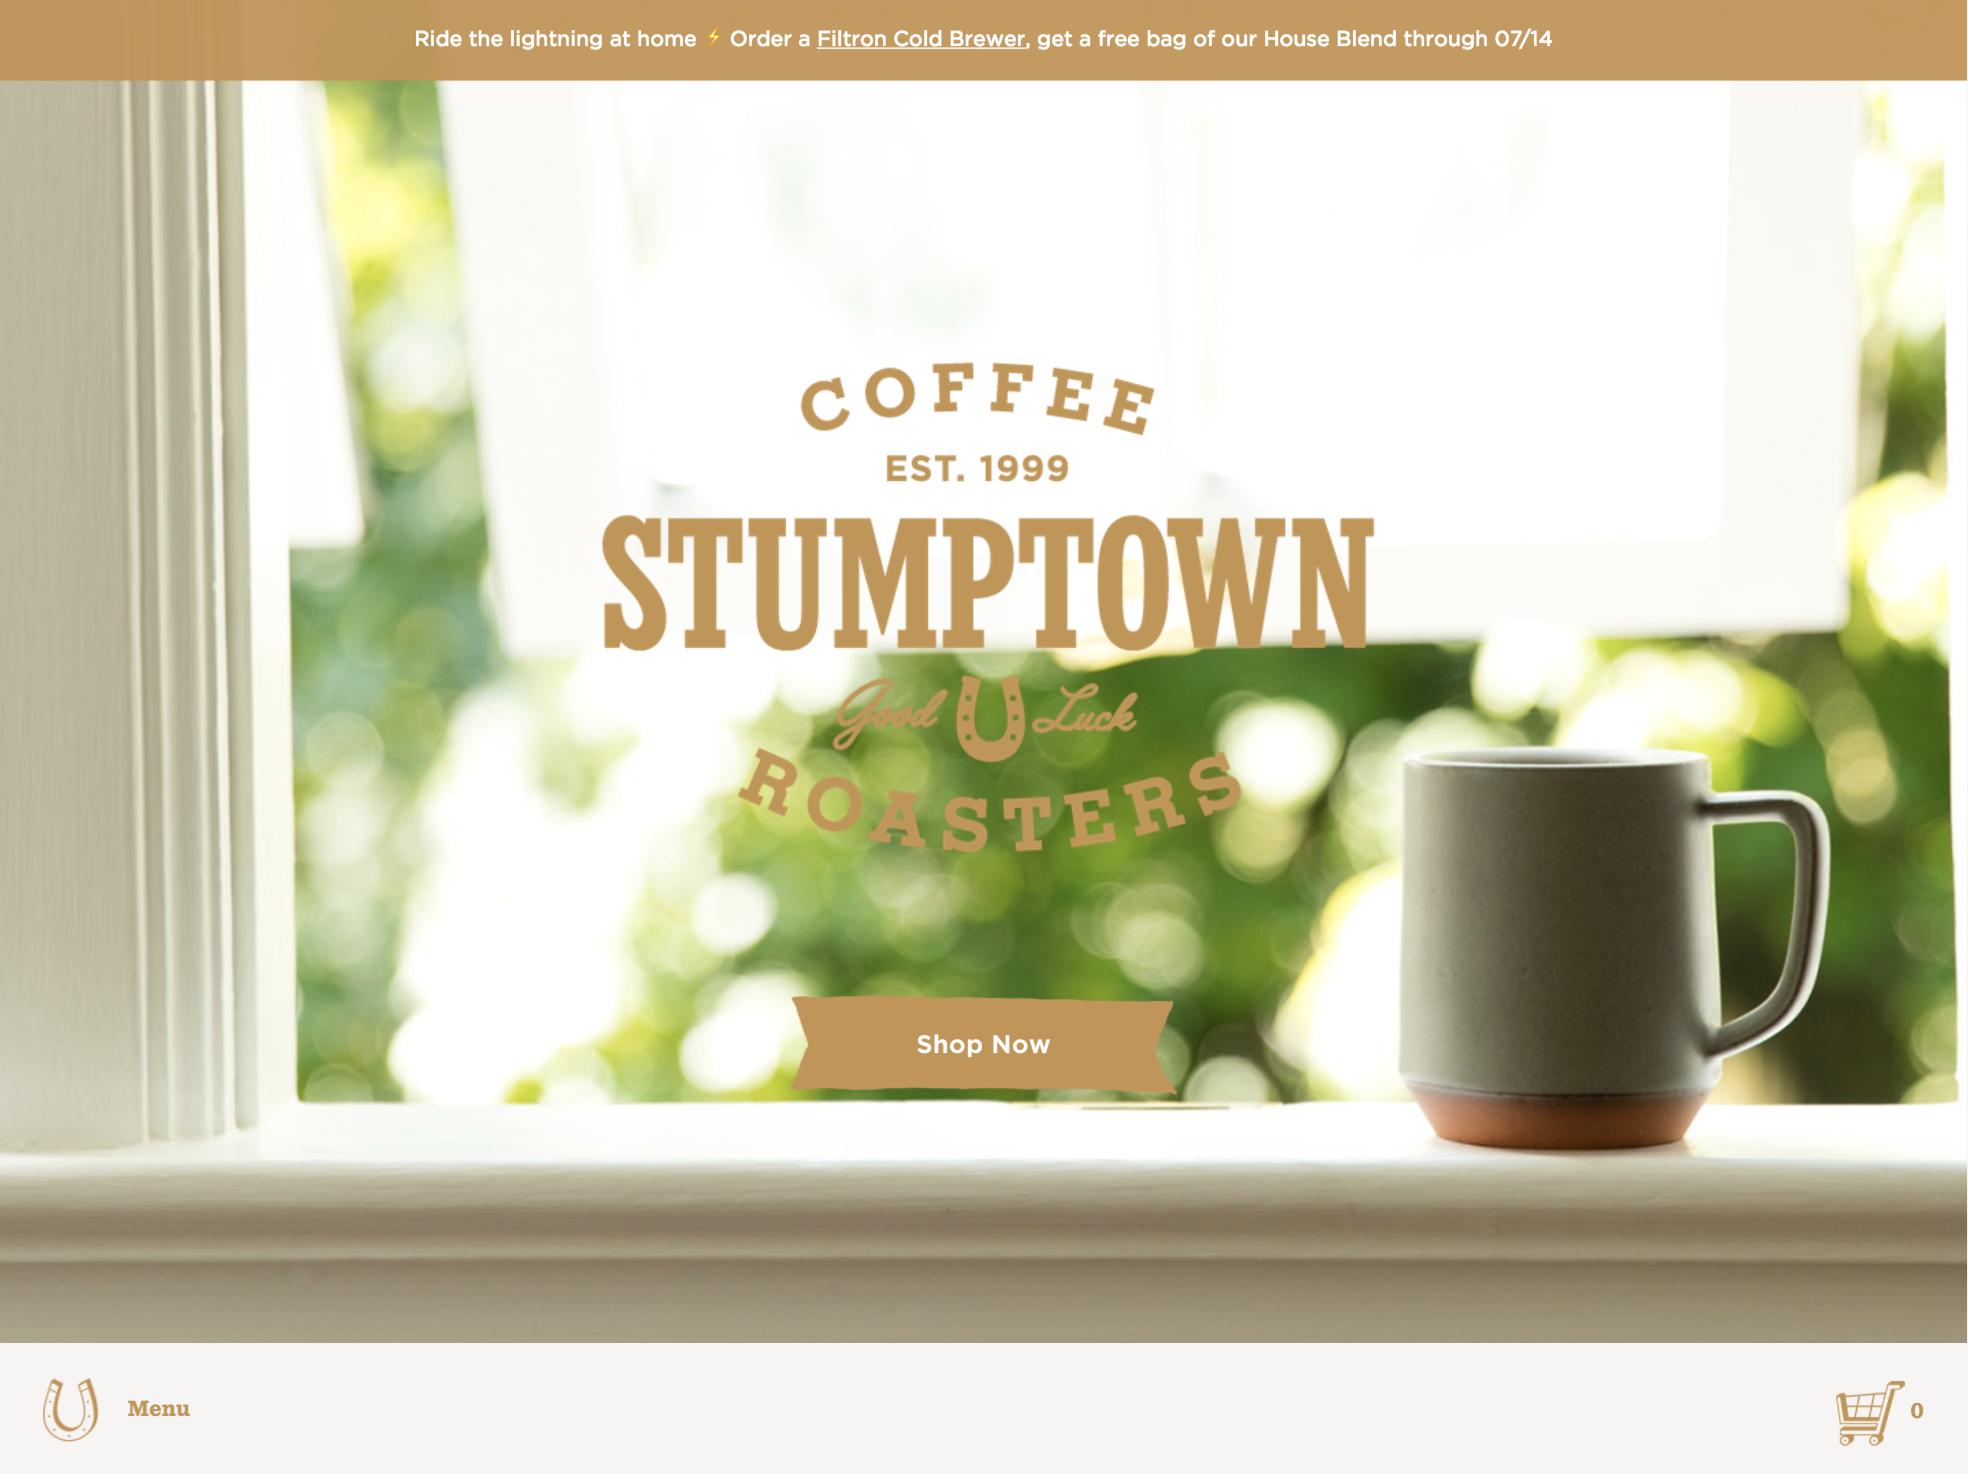 Stumptown Coffee home page